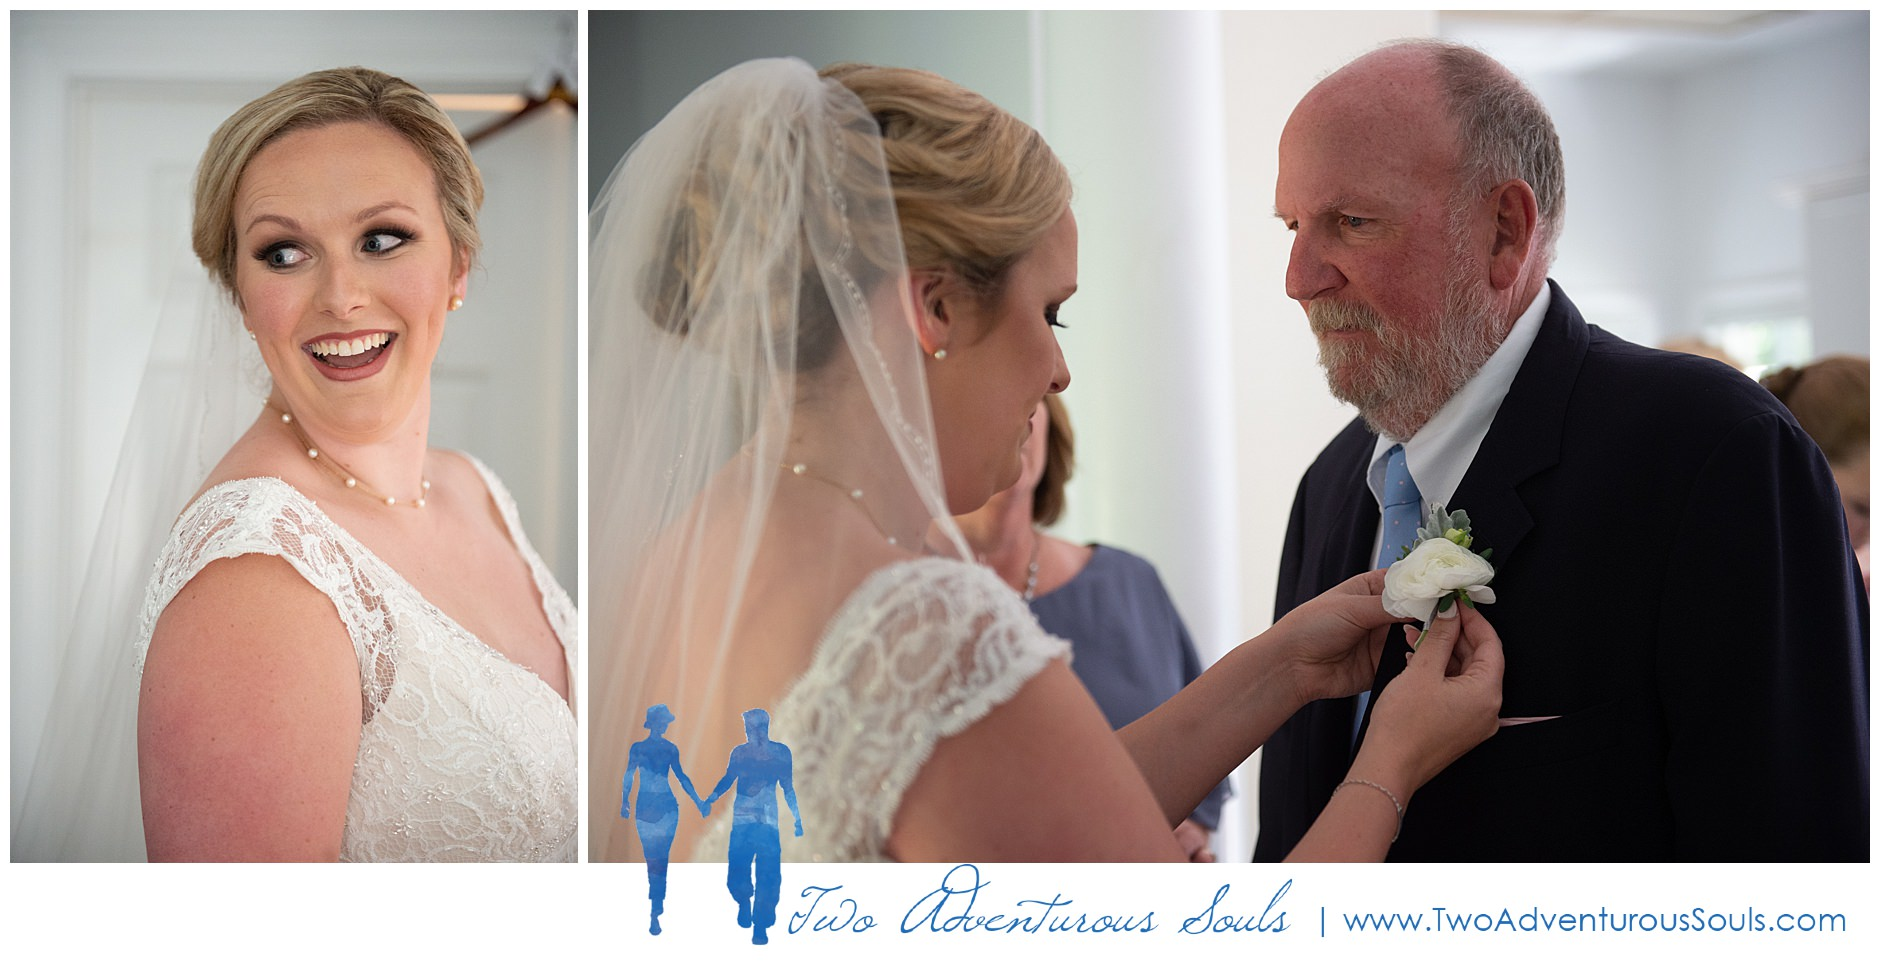 Cape Cod Wedding Photographers, Destination Wedding Photographers, Two Adventurous Souls-081019_0014.jpg